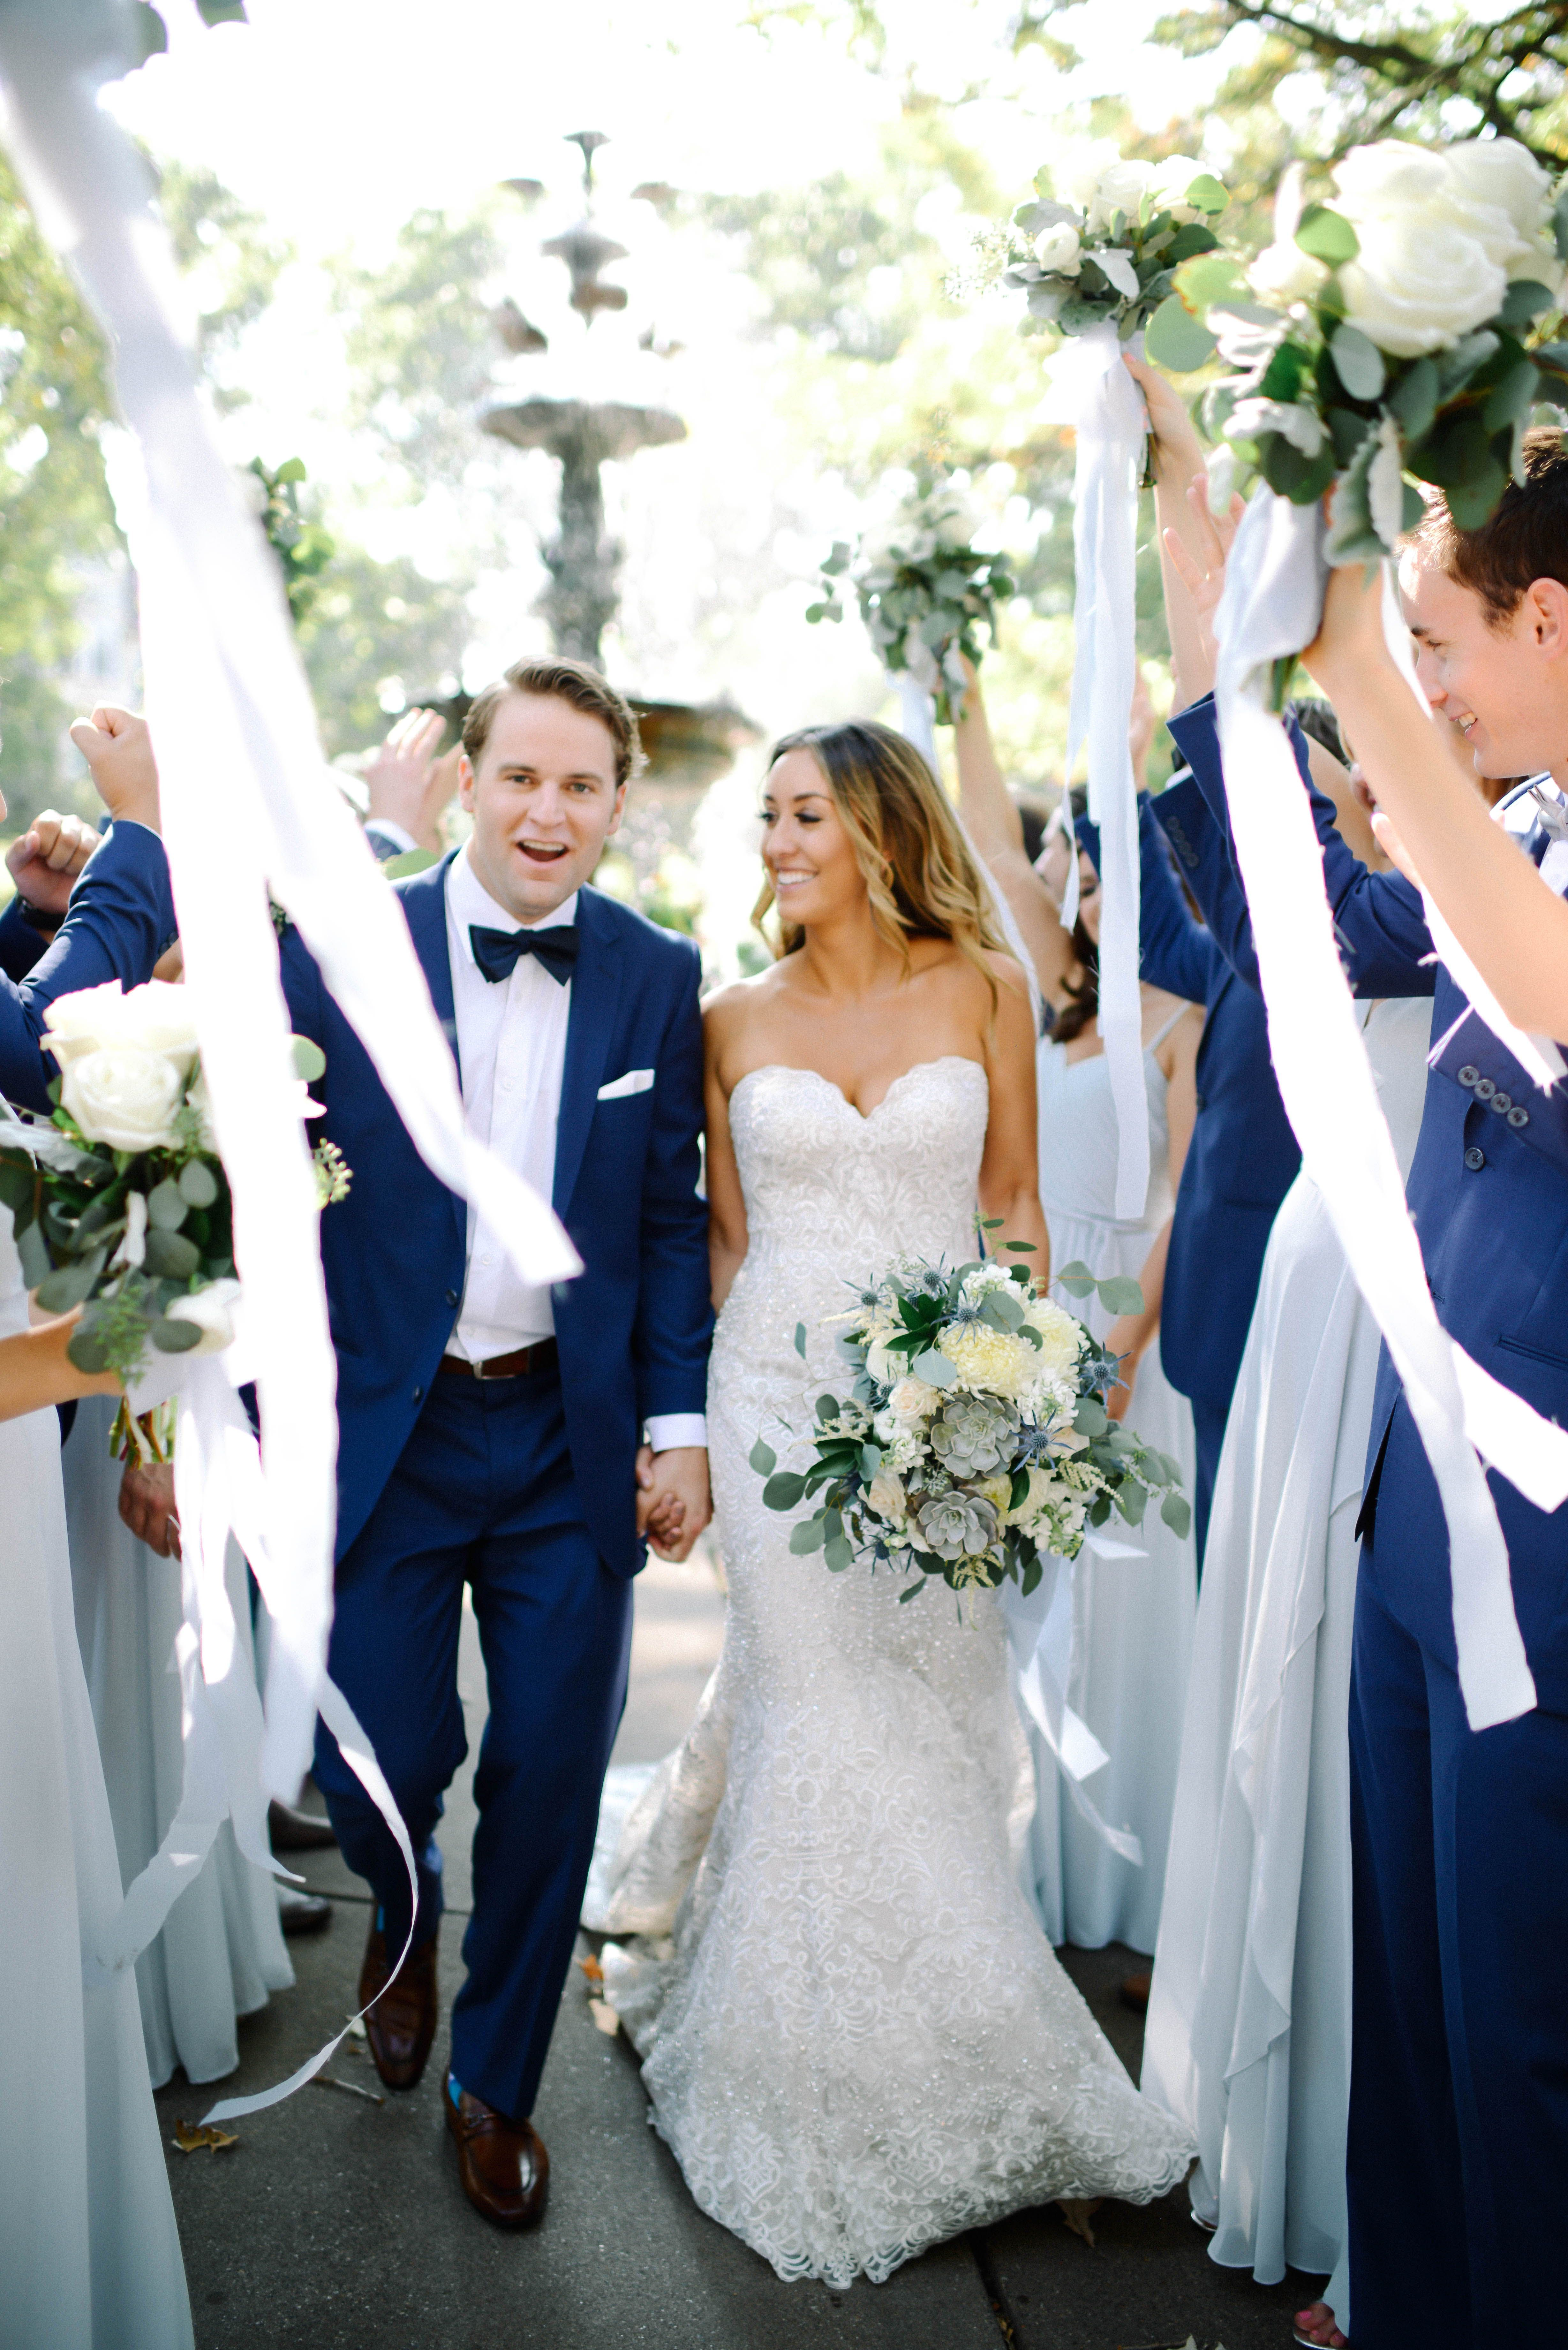 White and blue wedding dresses  MN September Wedding  Modern classic bride  Navy Blue Groom Suit